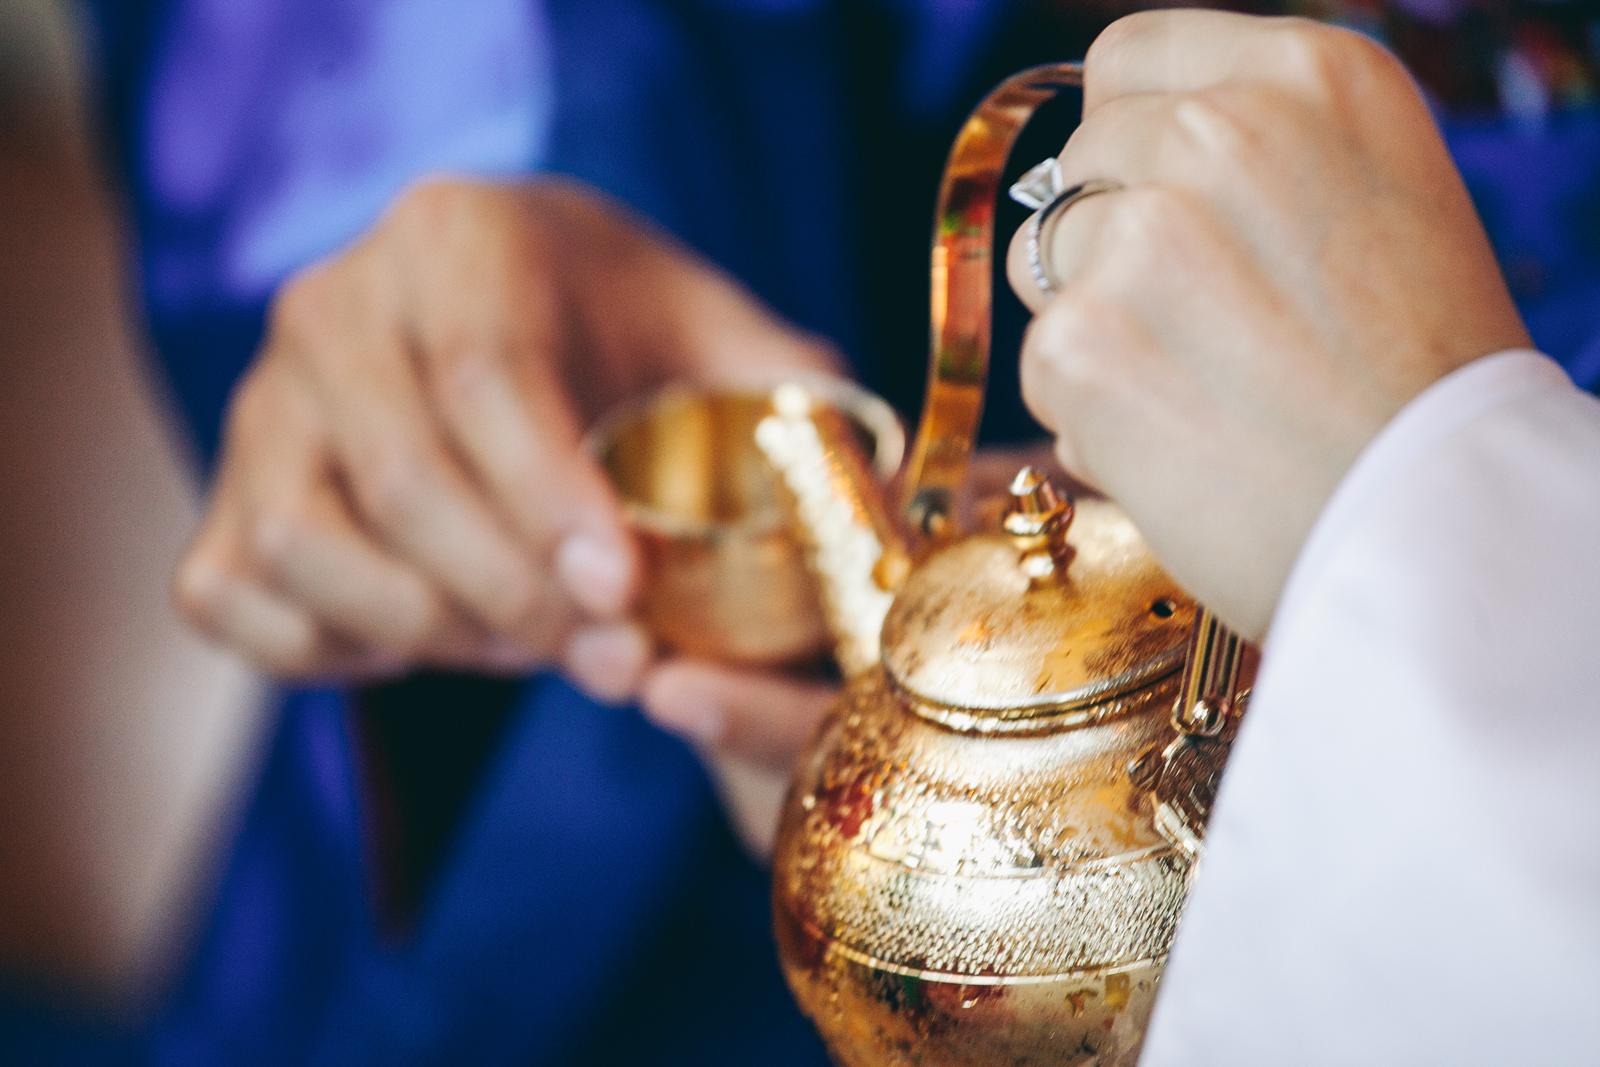 kohl_manison_wedding_photography_sarah_eric_ebony_siovhan_bokeh_photography_066.jpg